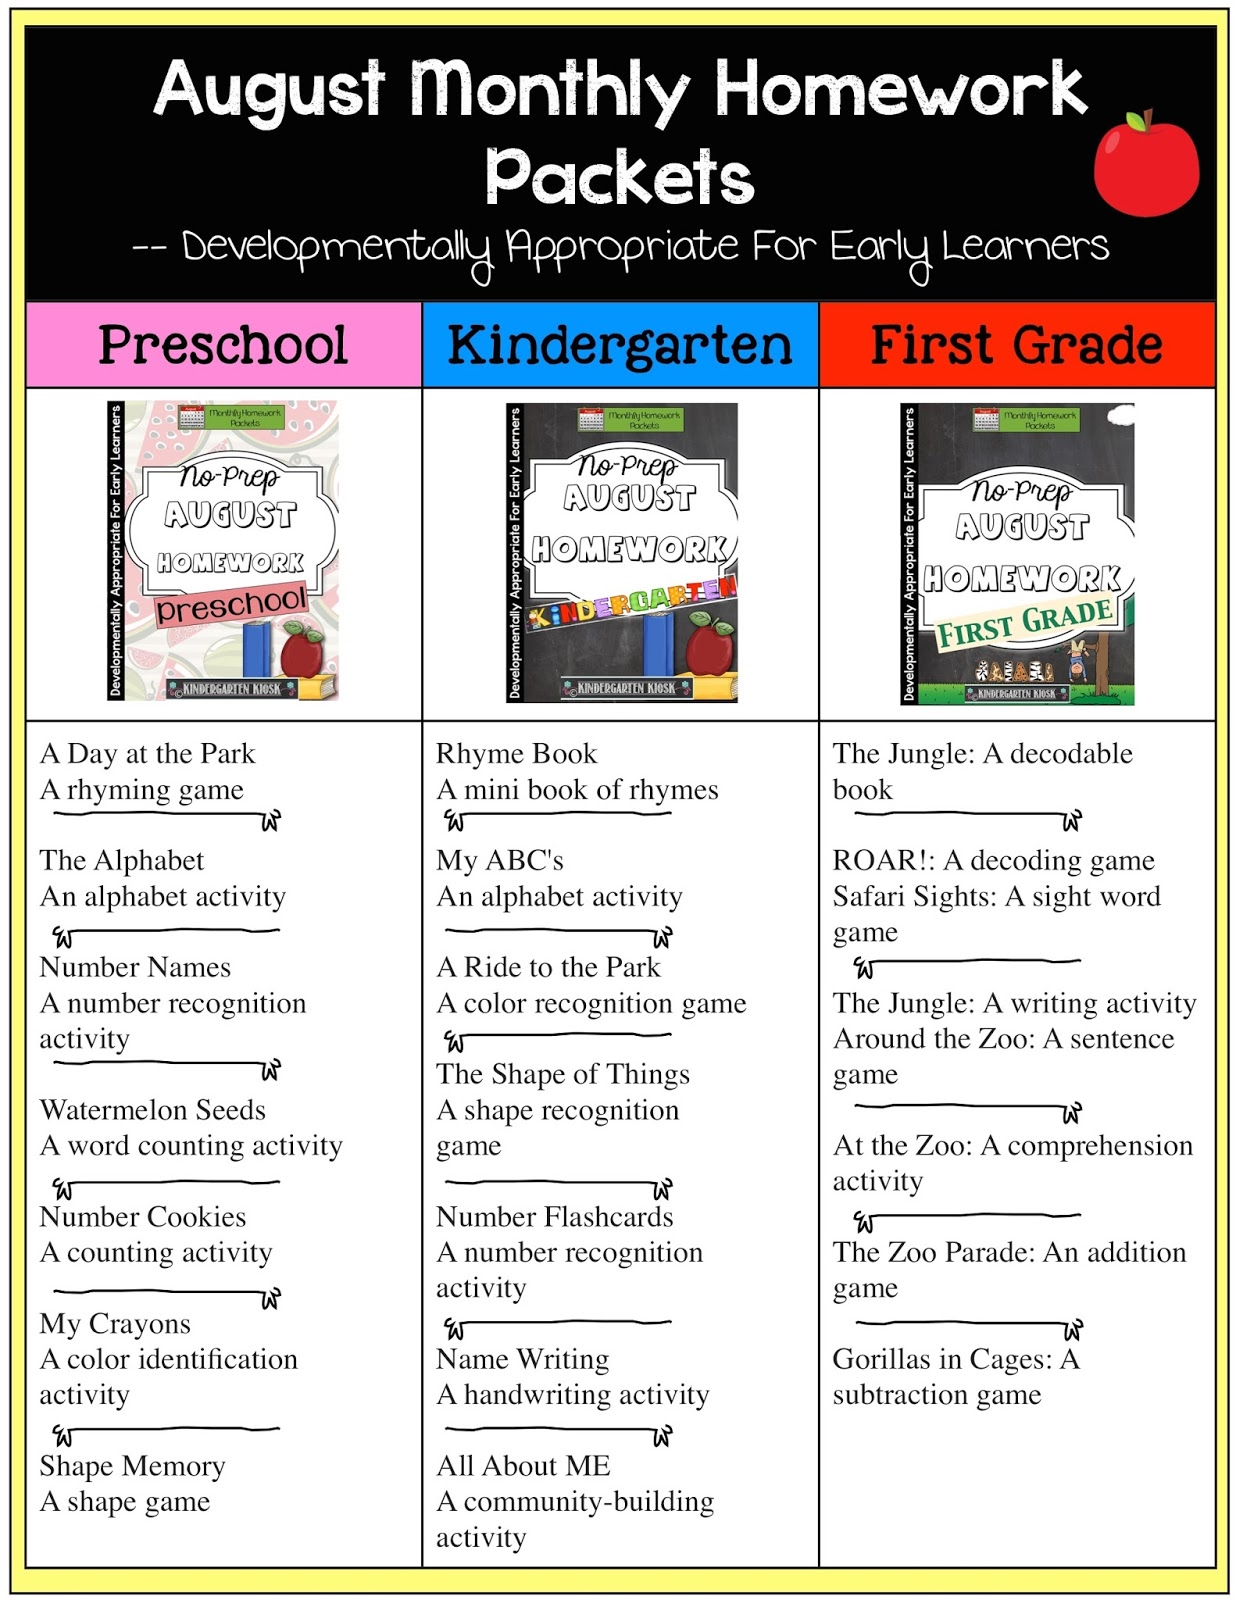 Kindergarten Kiosk Welcome To Kindergarten Homework Packets English And Spanish Versions